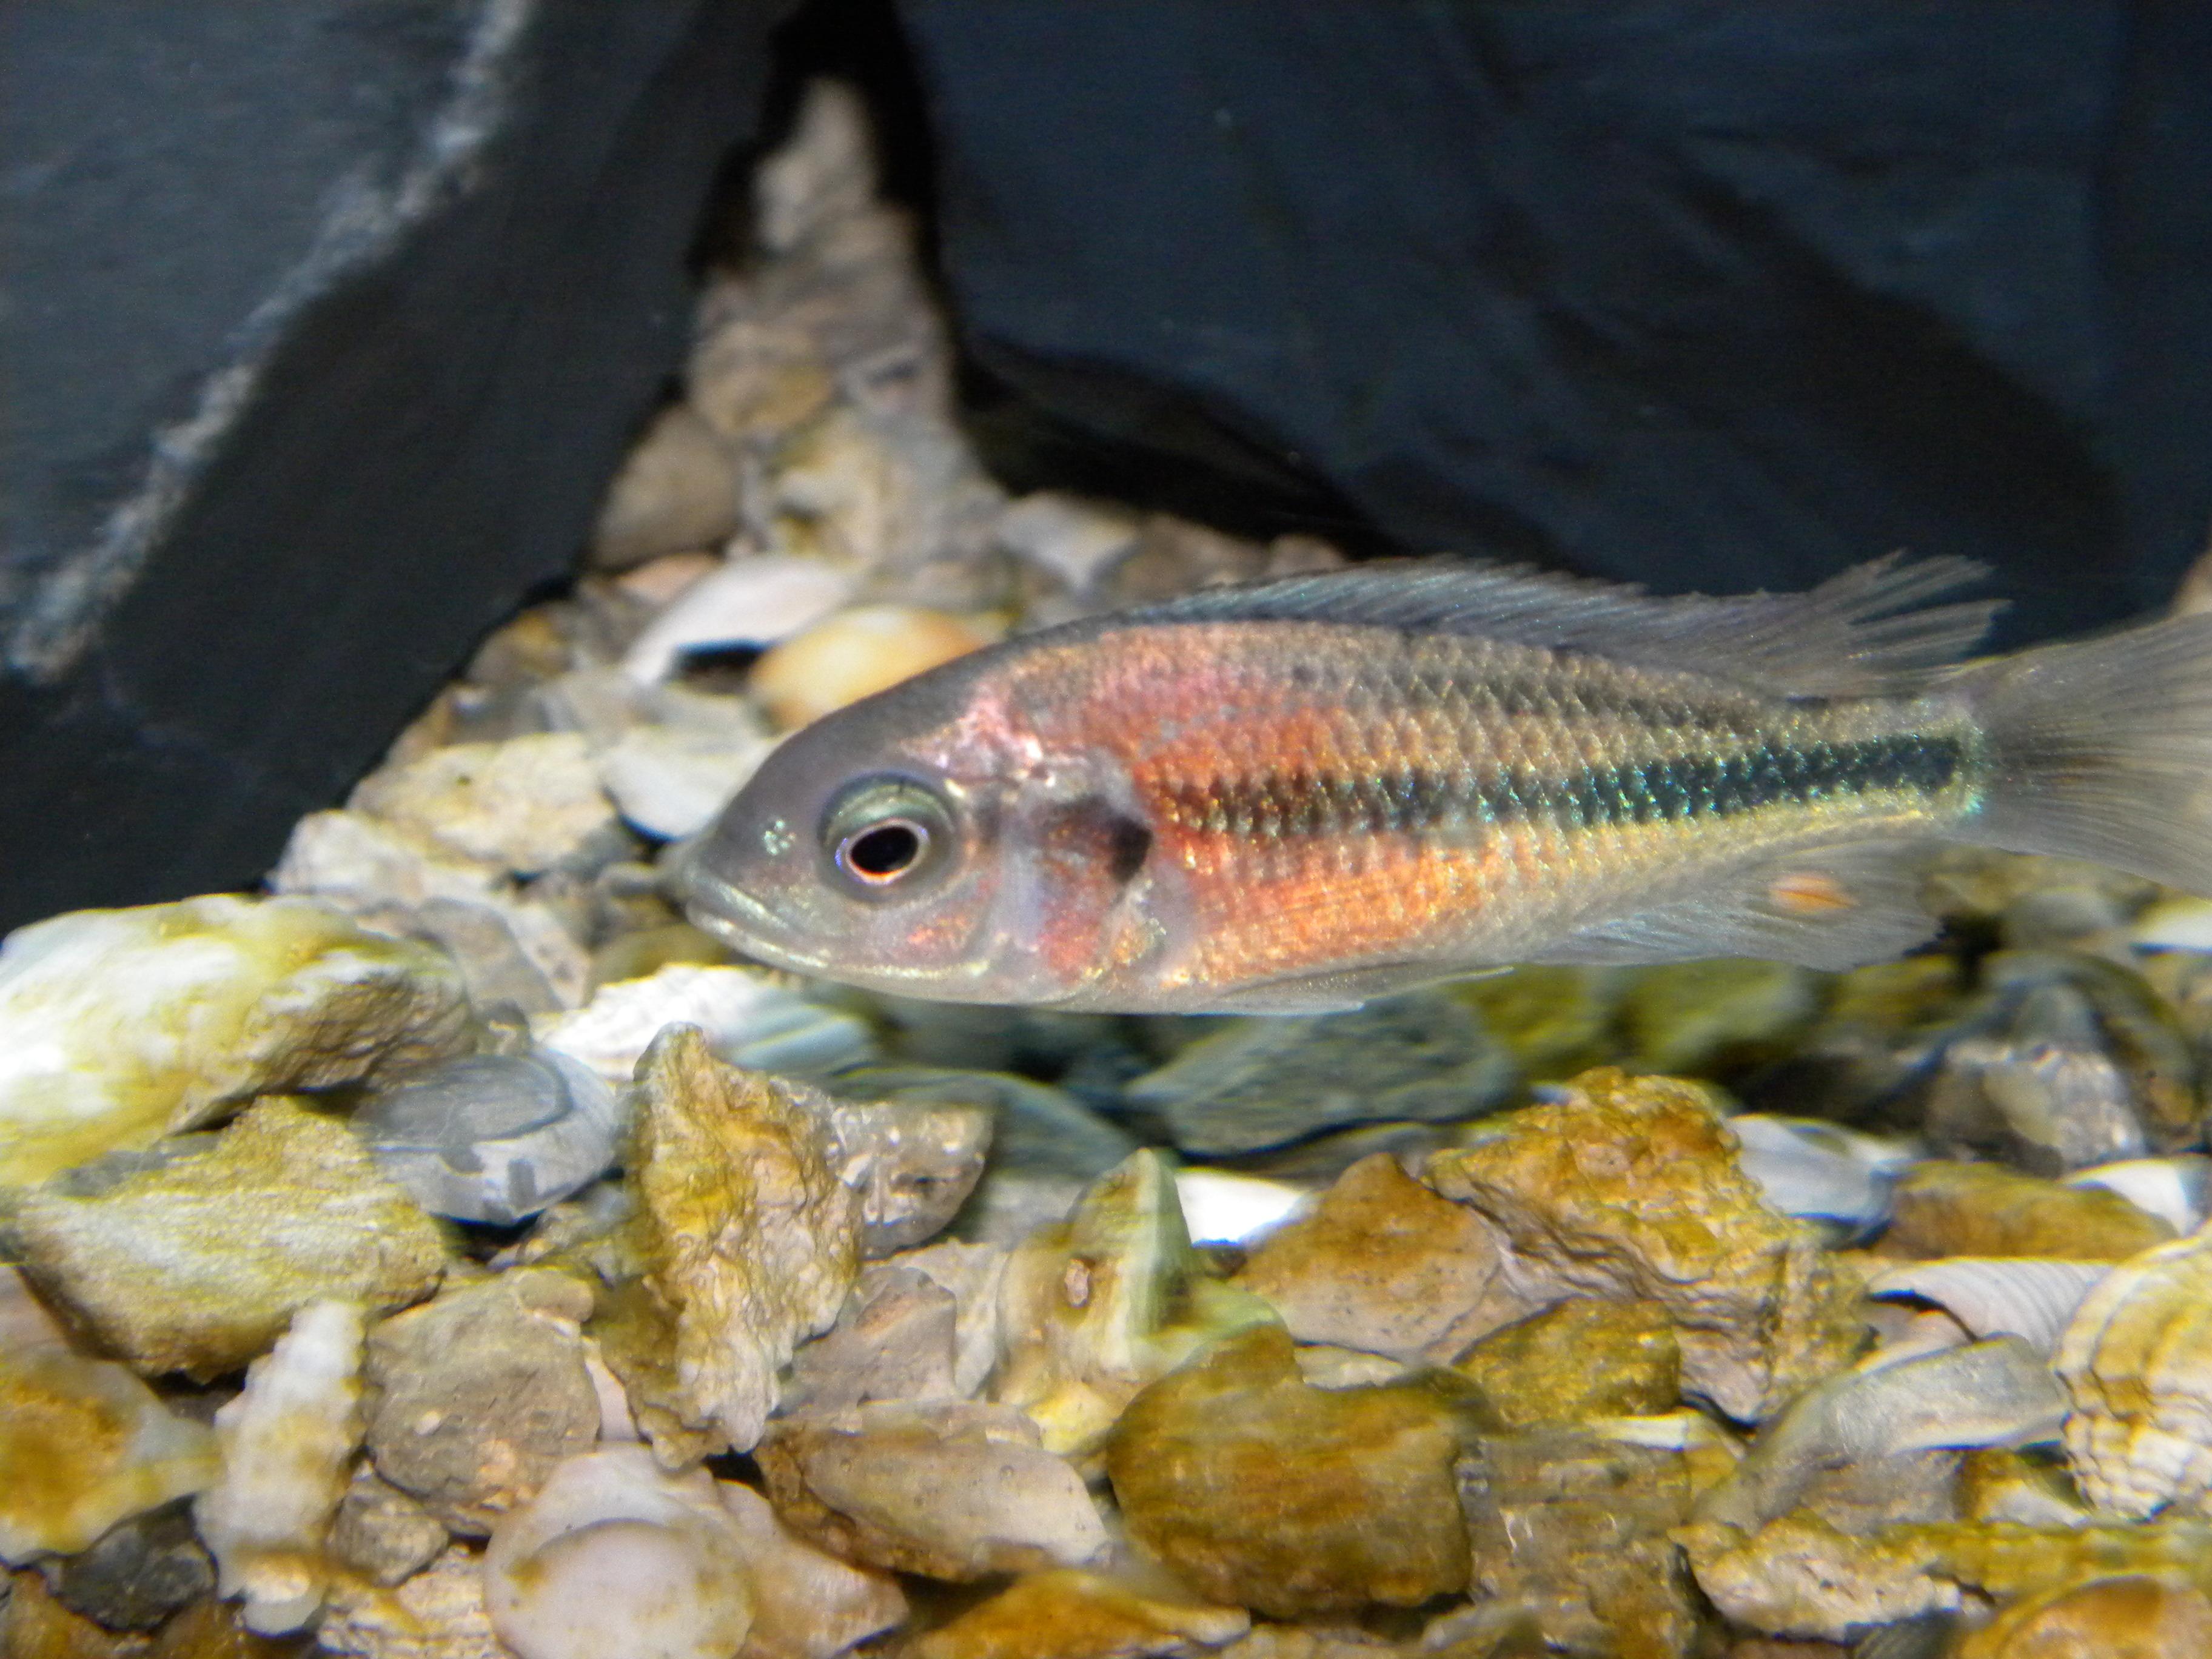 cichlids.com: hippo point salmon